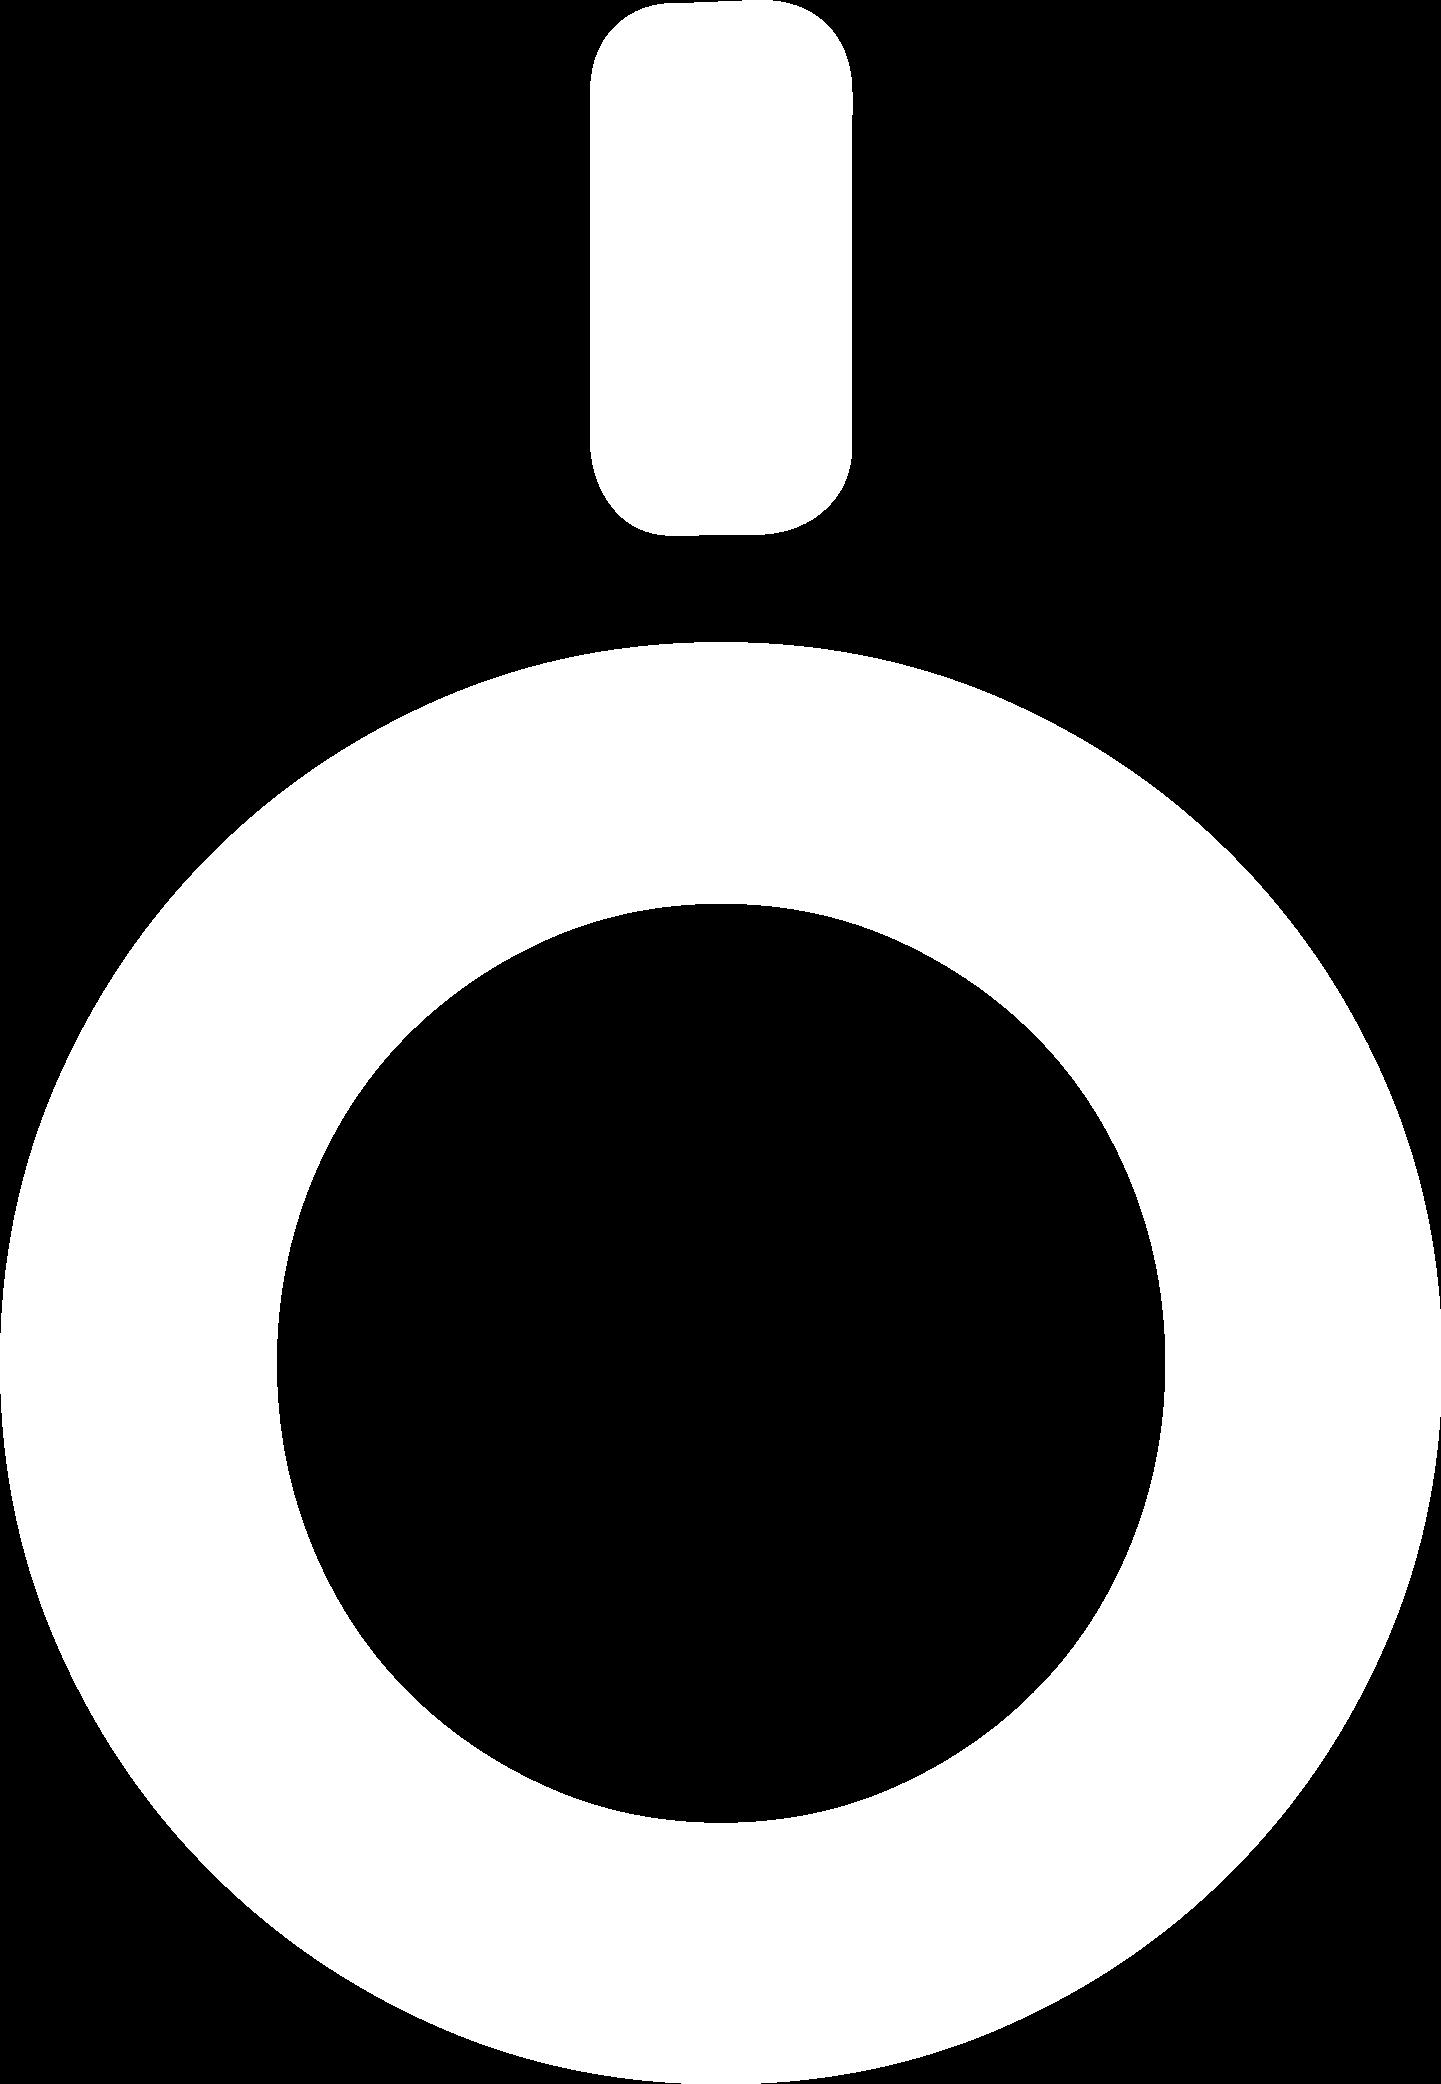 isotipo-blanco-sinfondo